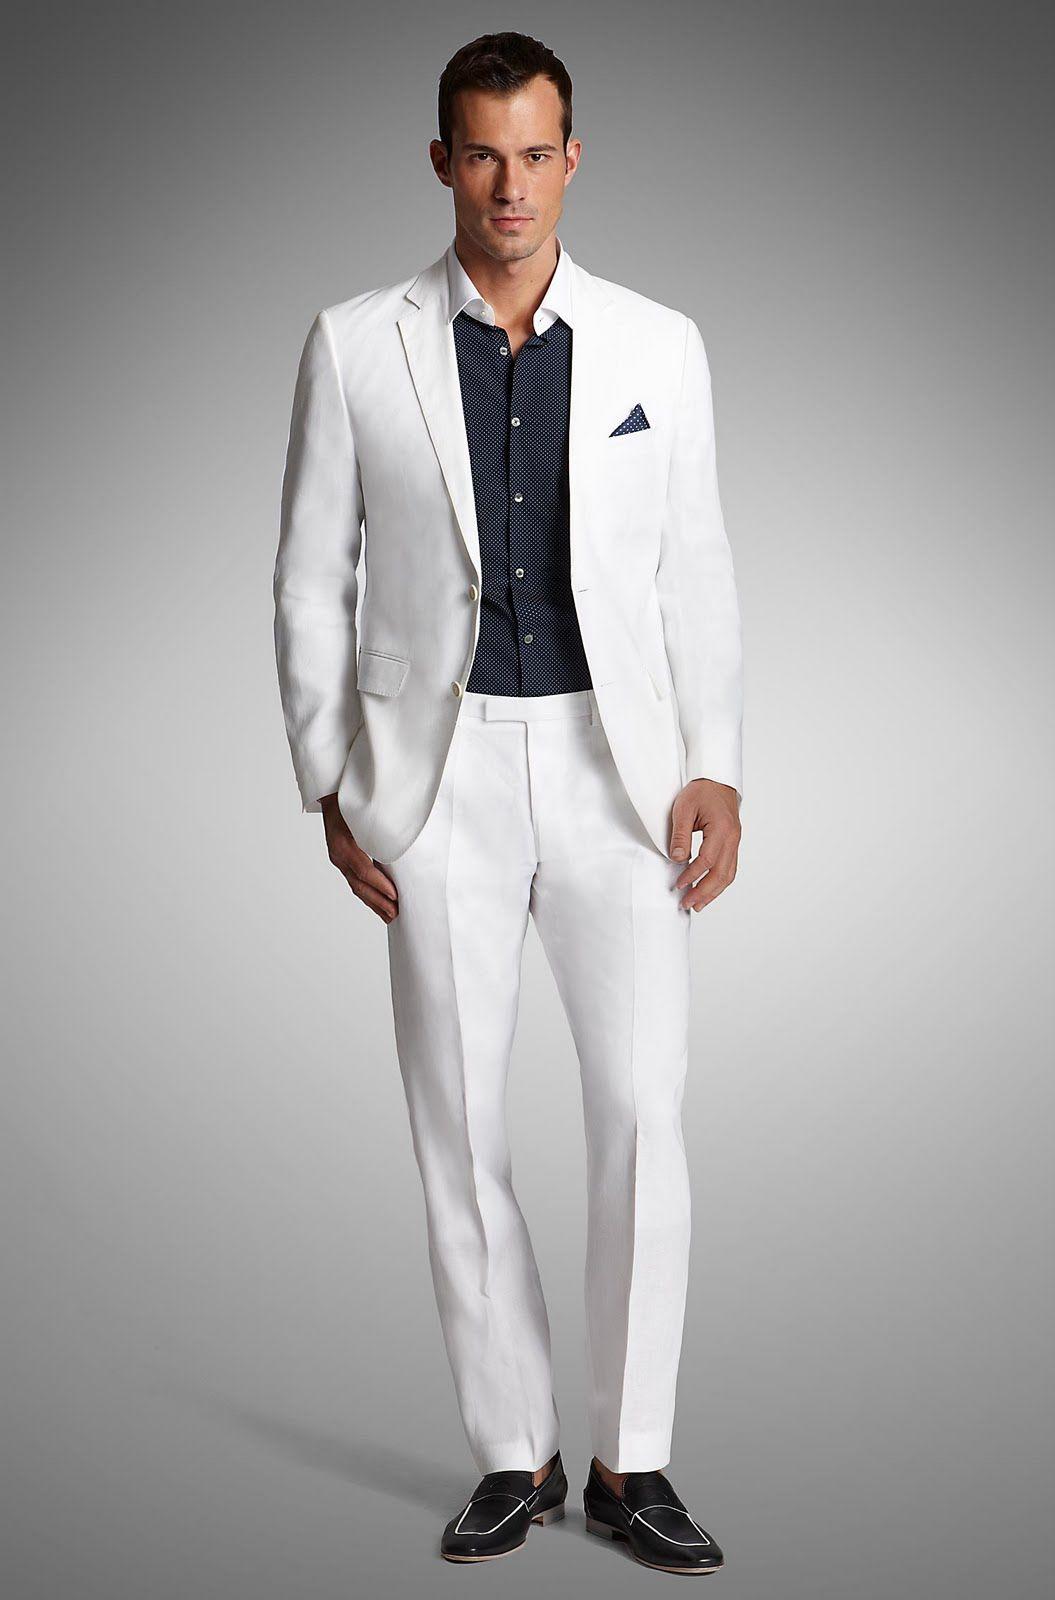 Black Men Fashion | Brand: White Classic Fit Lightweight Linen ...